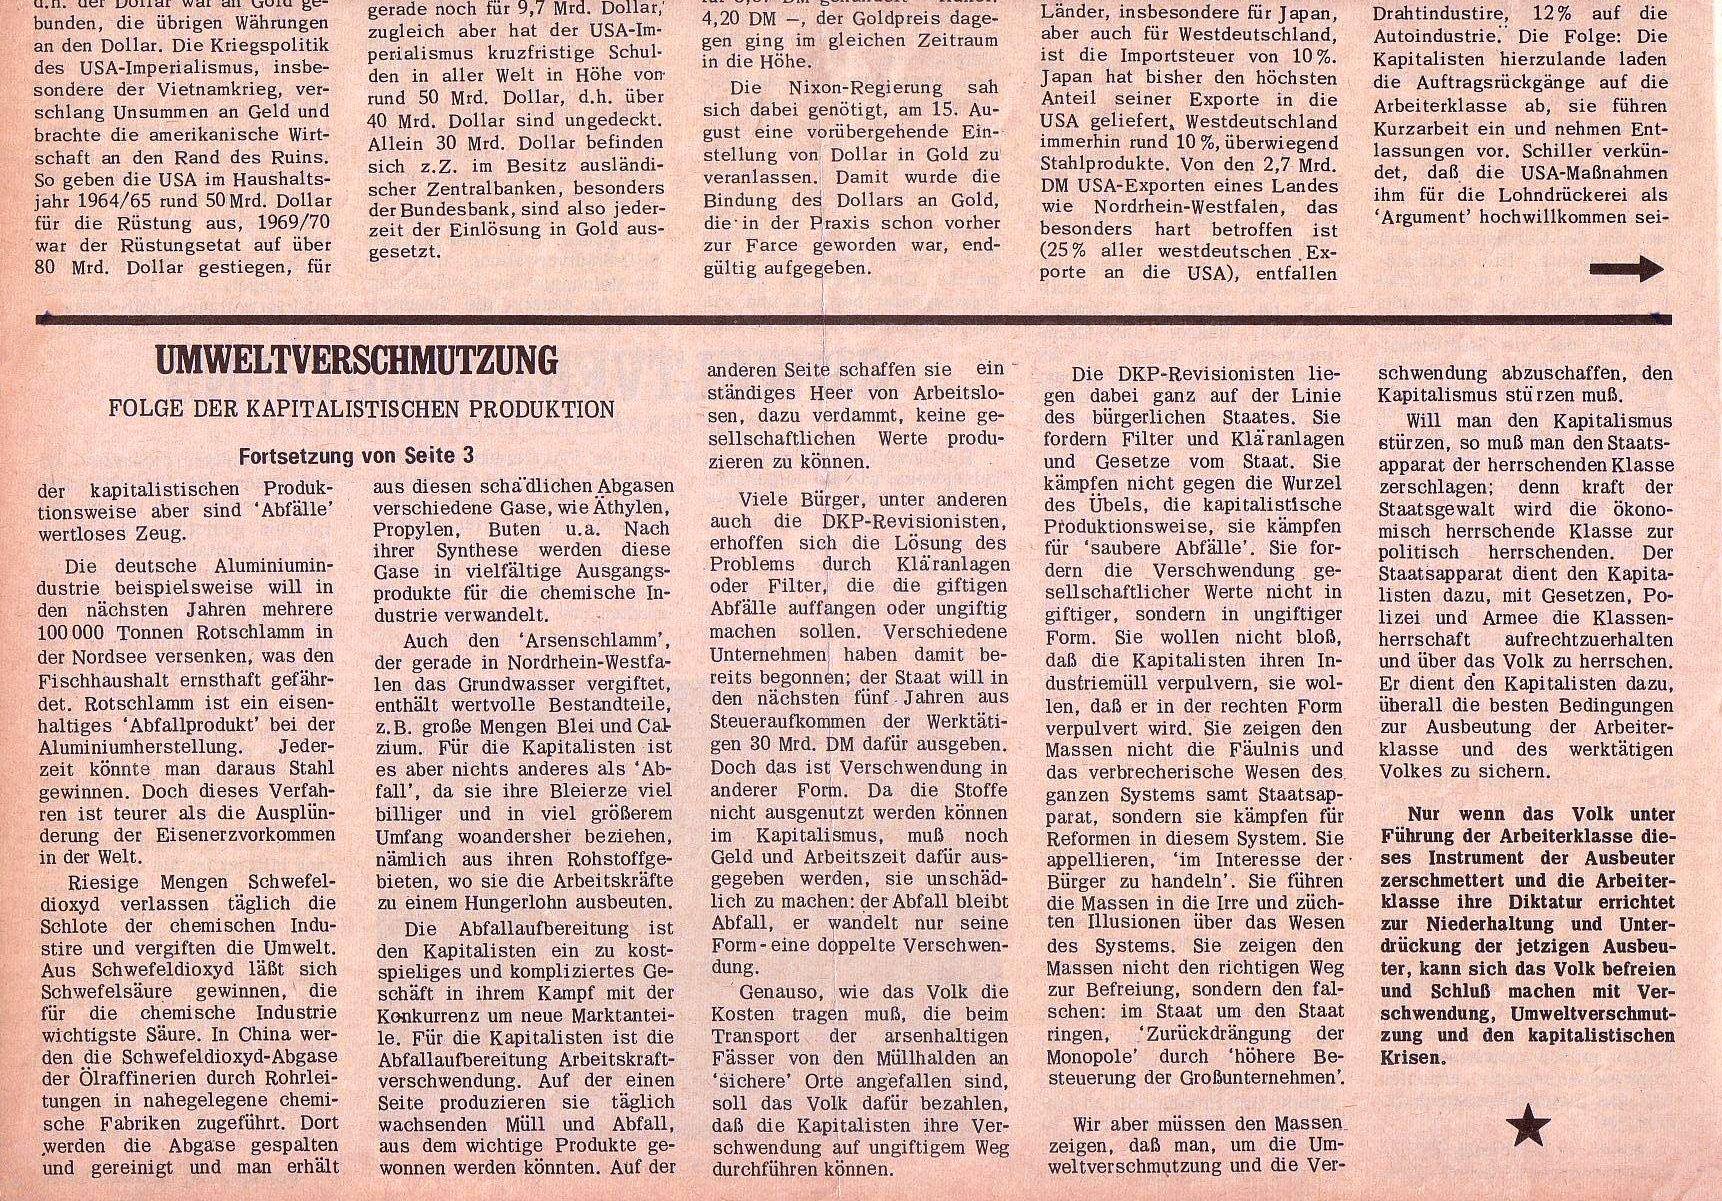 Roter Morgen, 5. Jg., 27. September 1971, Nr. 10, Seite 4b